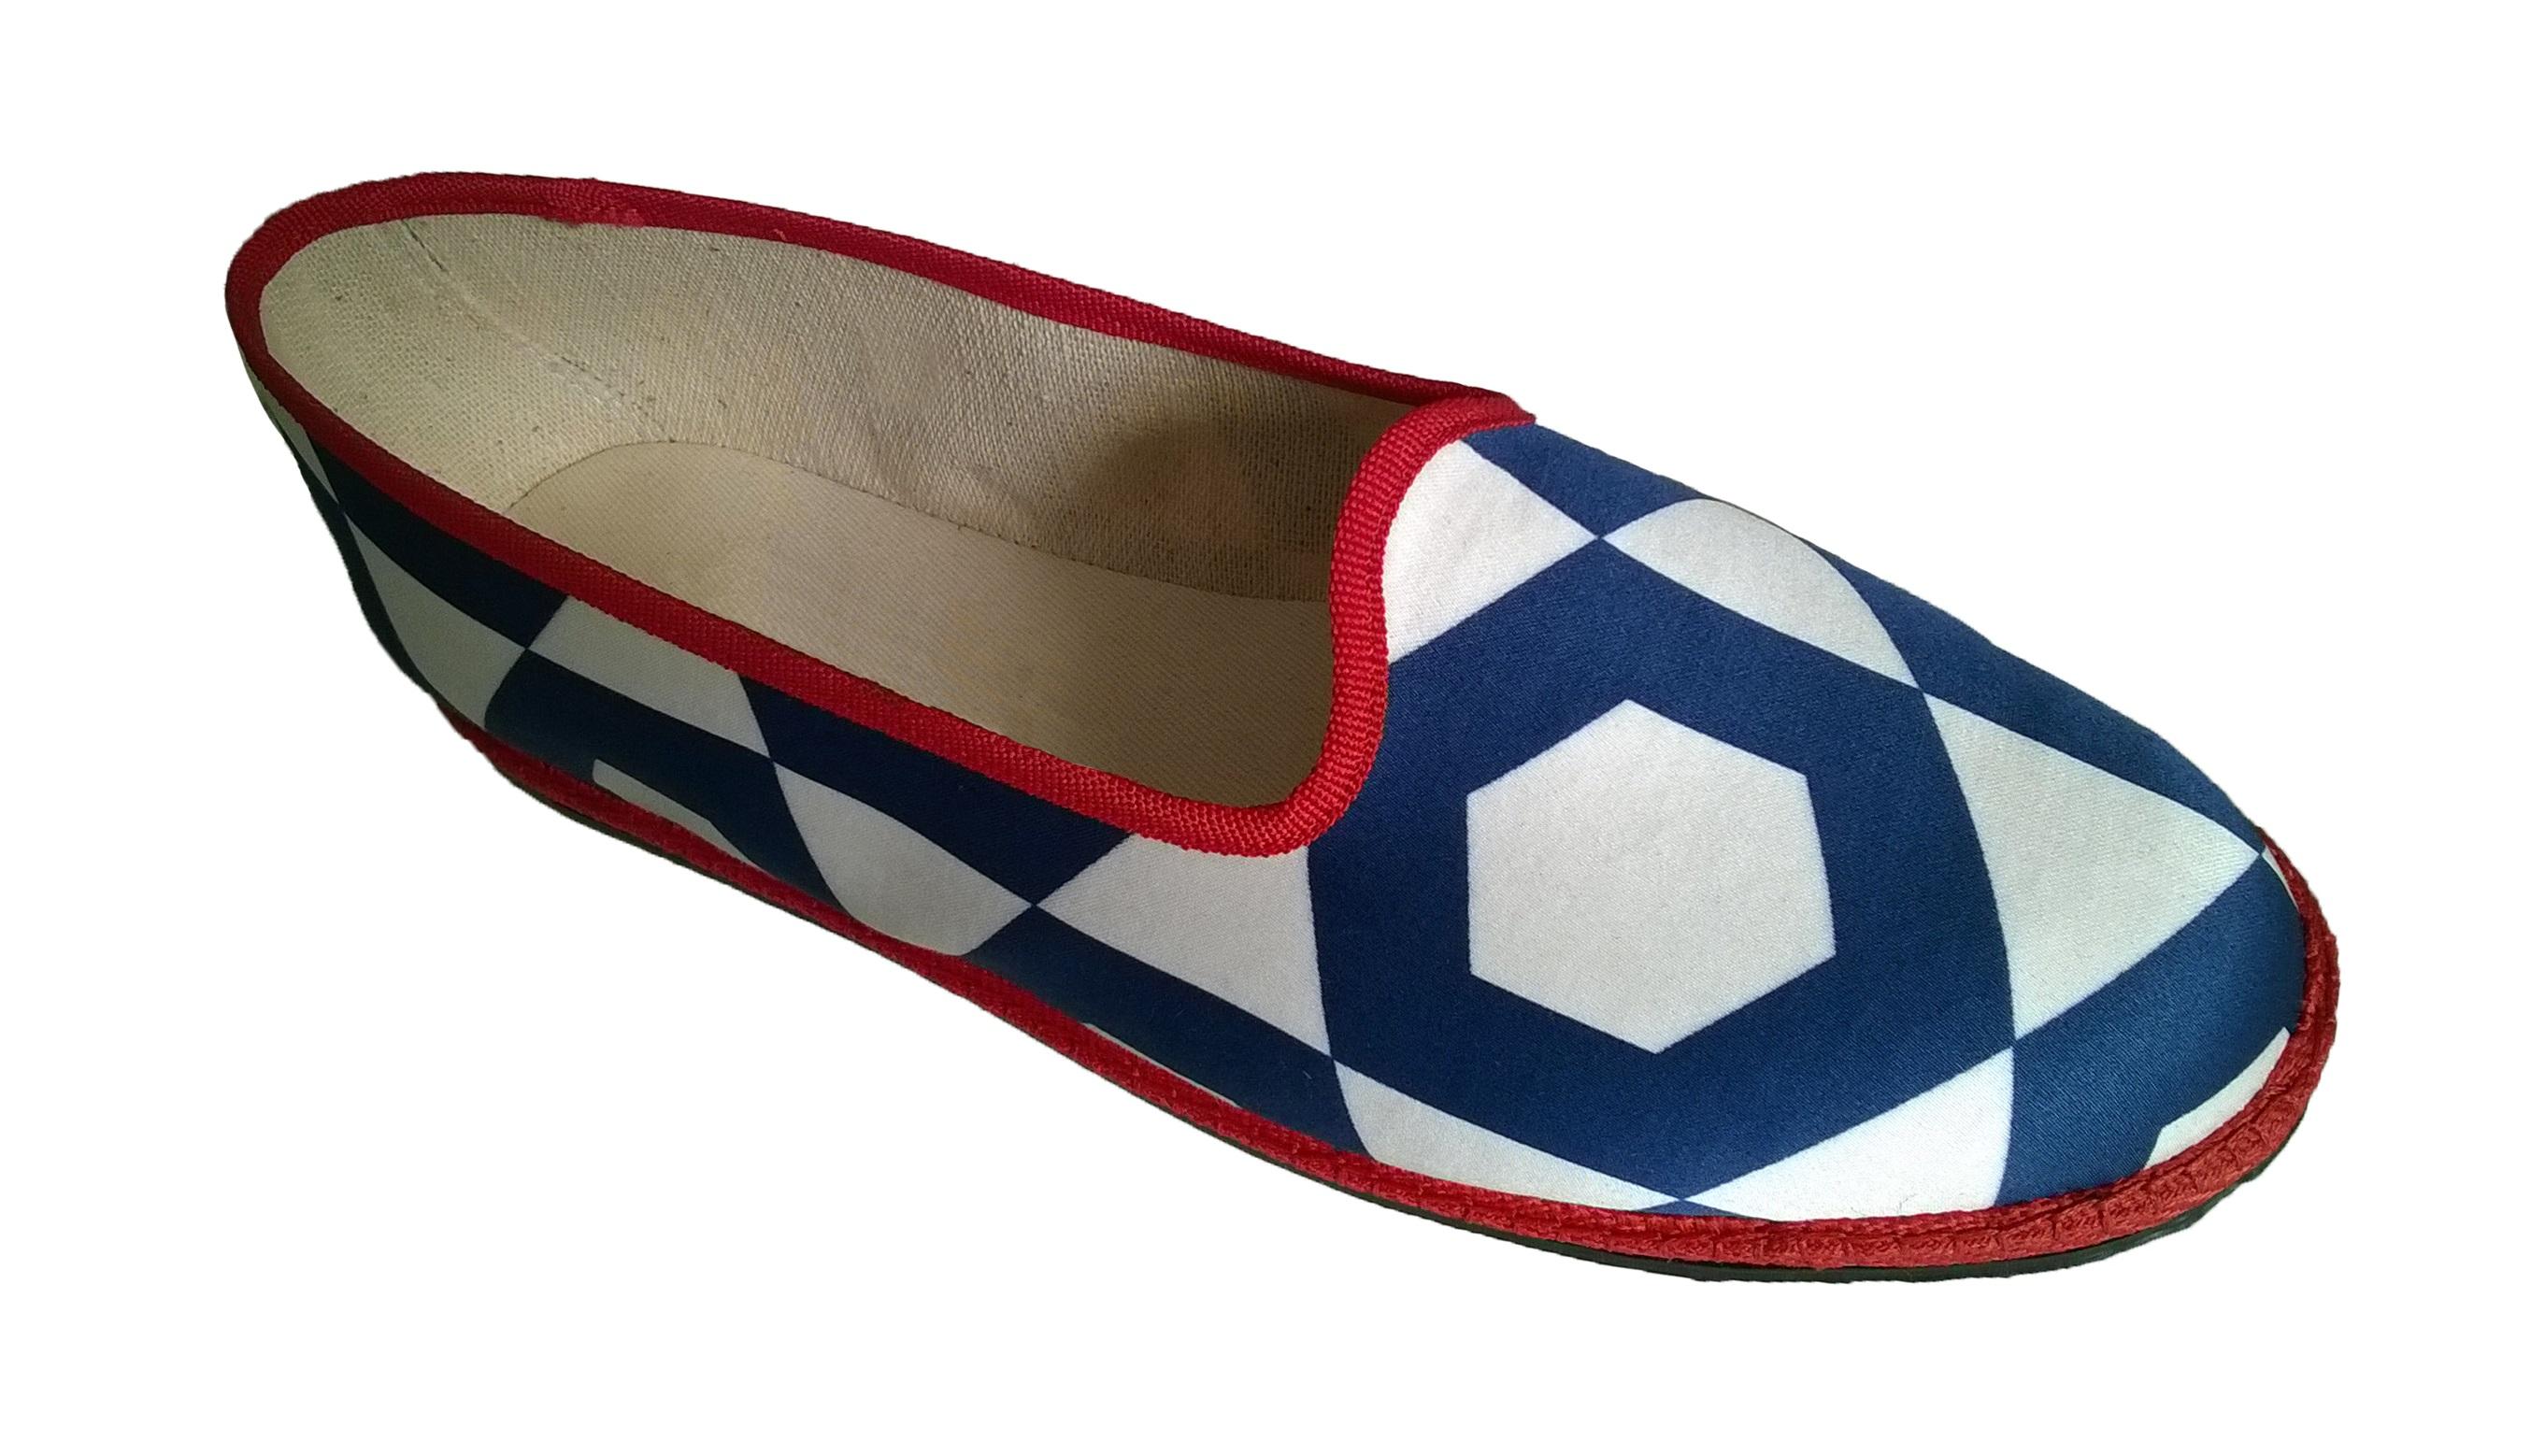 size 40 89c17 4b34f Furlane - Le originali scarpe artigianali create da ...